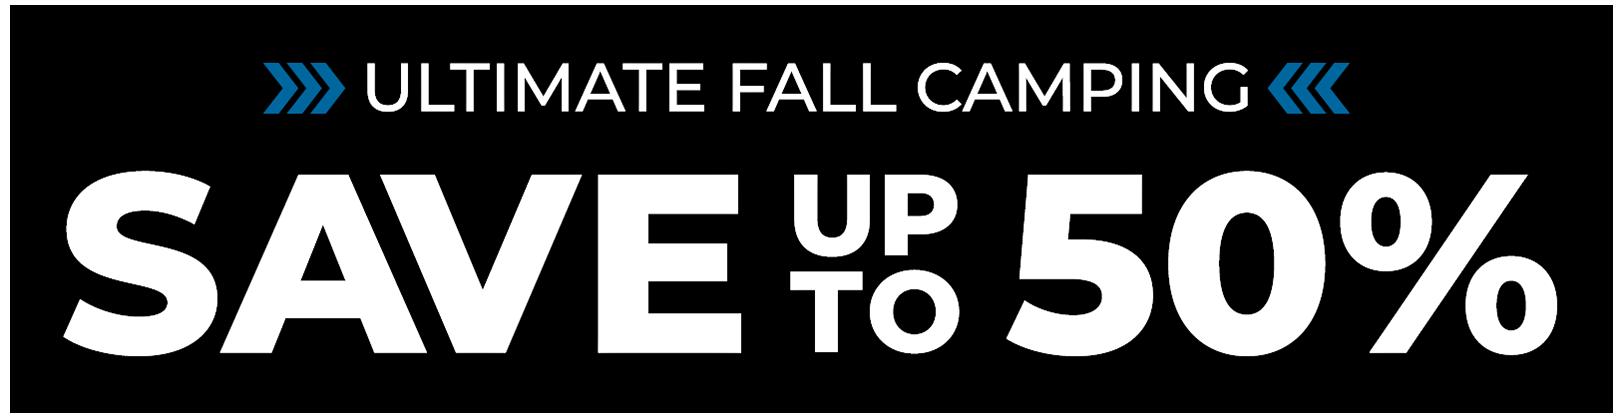 Ultimate Fall Camping